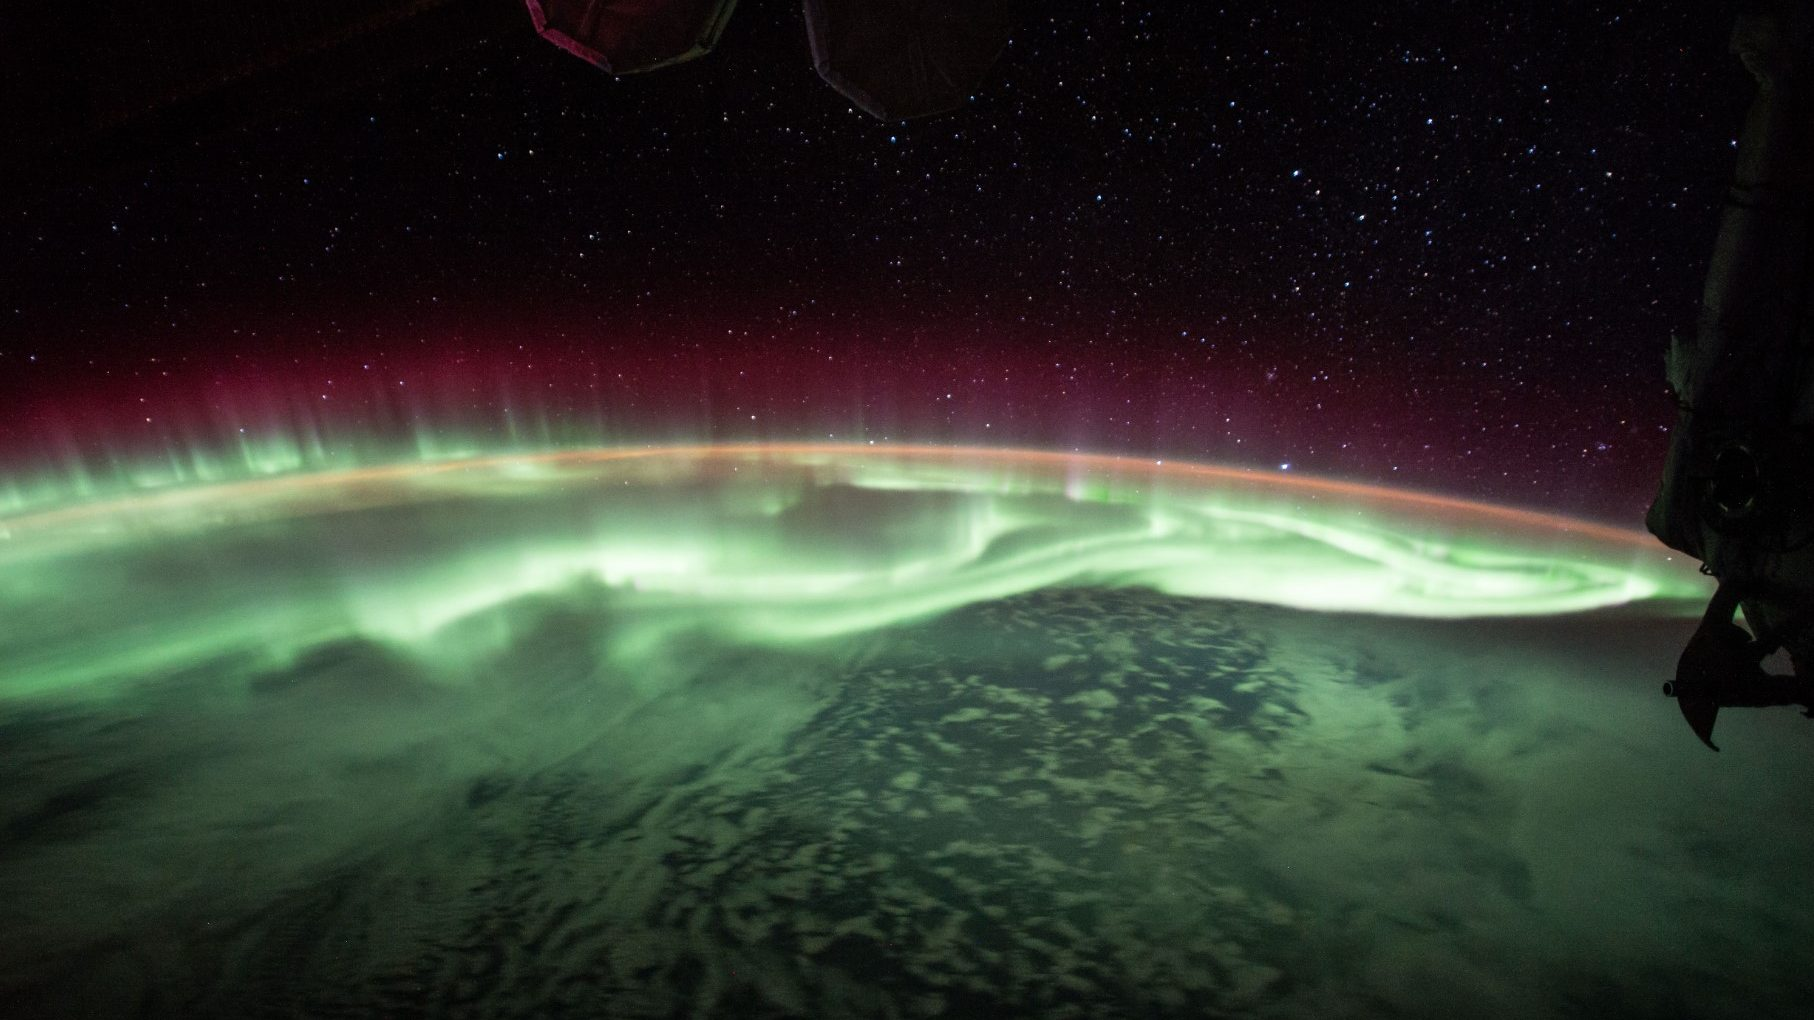 Günün Astronomi Görseli (APOD/NASA) | 14/01/21